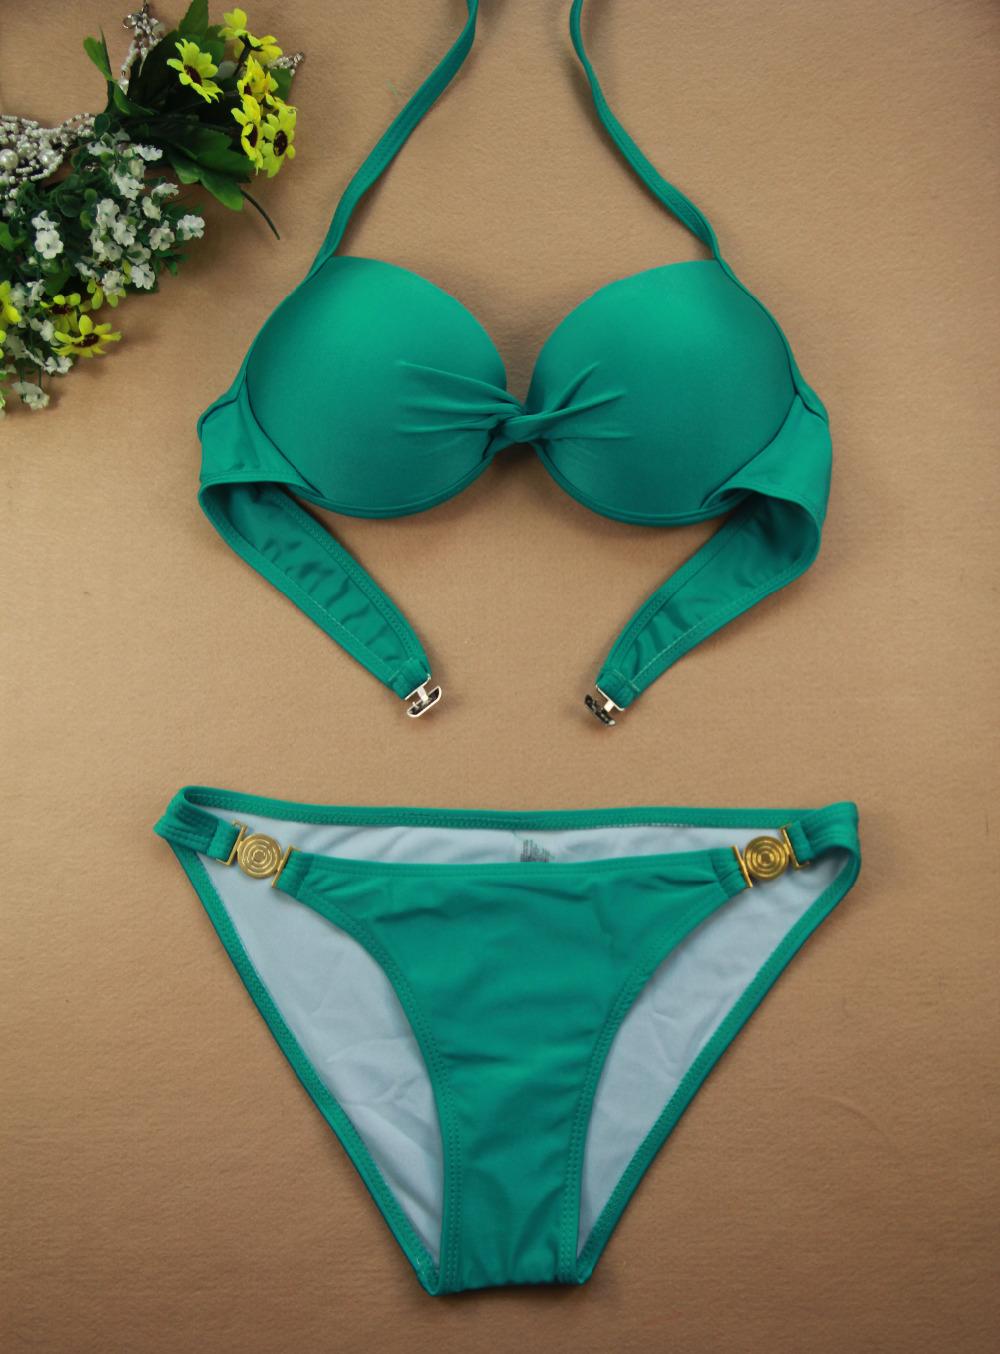 Solid Bandage Swimwear Women Brand Bikini Set Triangl Swimsuit Neoprene Beachwear Swimsuit Vintage Bathing suit Push Up Bikini(China (Mainland))